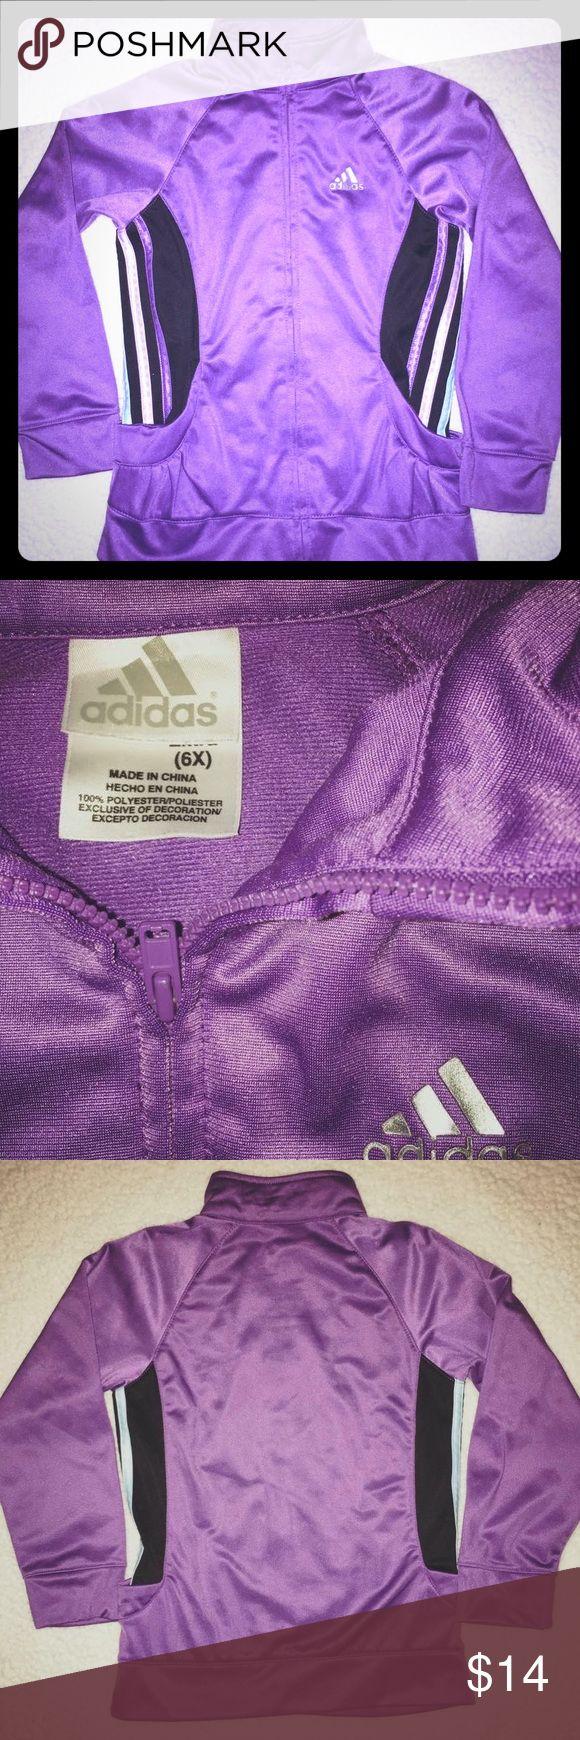 Adidas girls Sz 6X Zip Up Girls 6X Adidas Purple Zip up like new! TOO CUTE adidas Shirts & Tops Sweatshirts & Hoodies